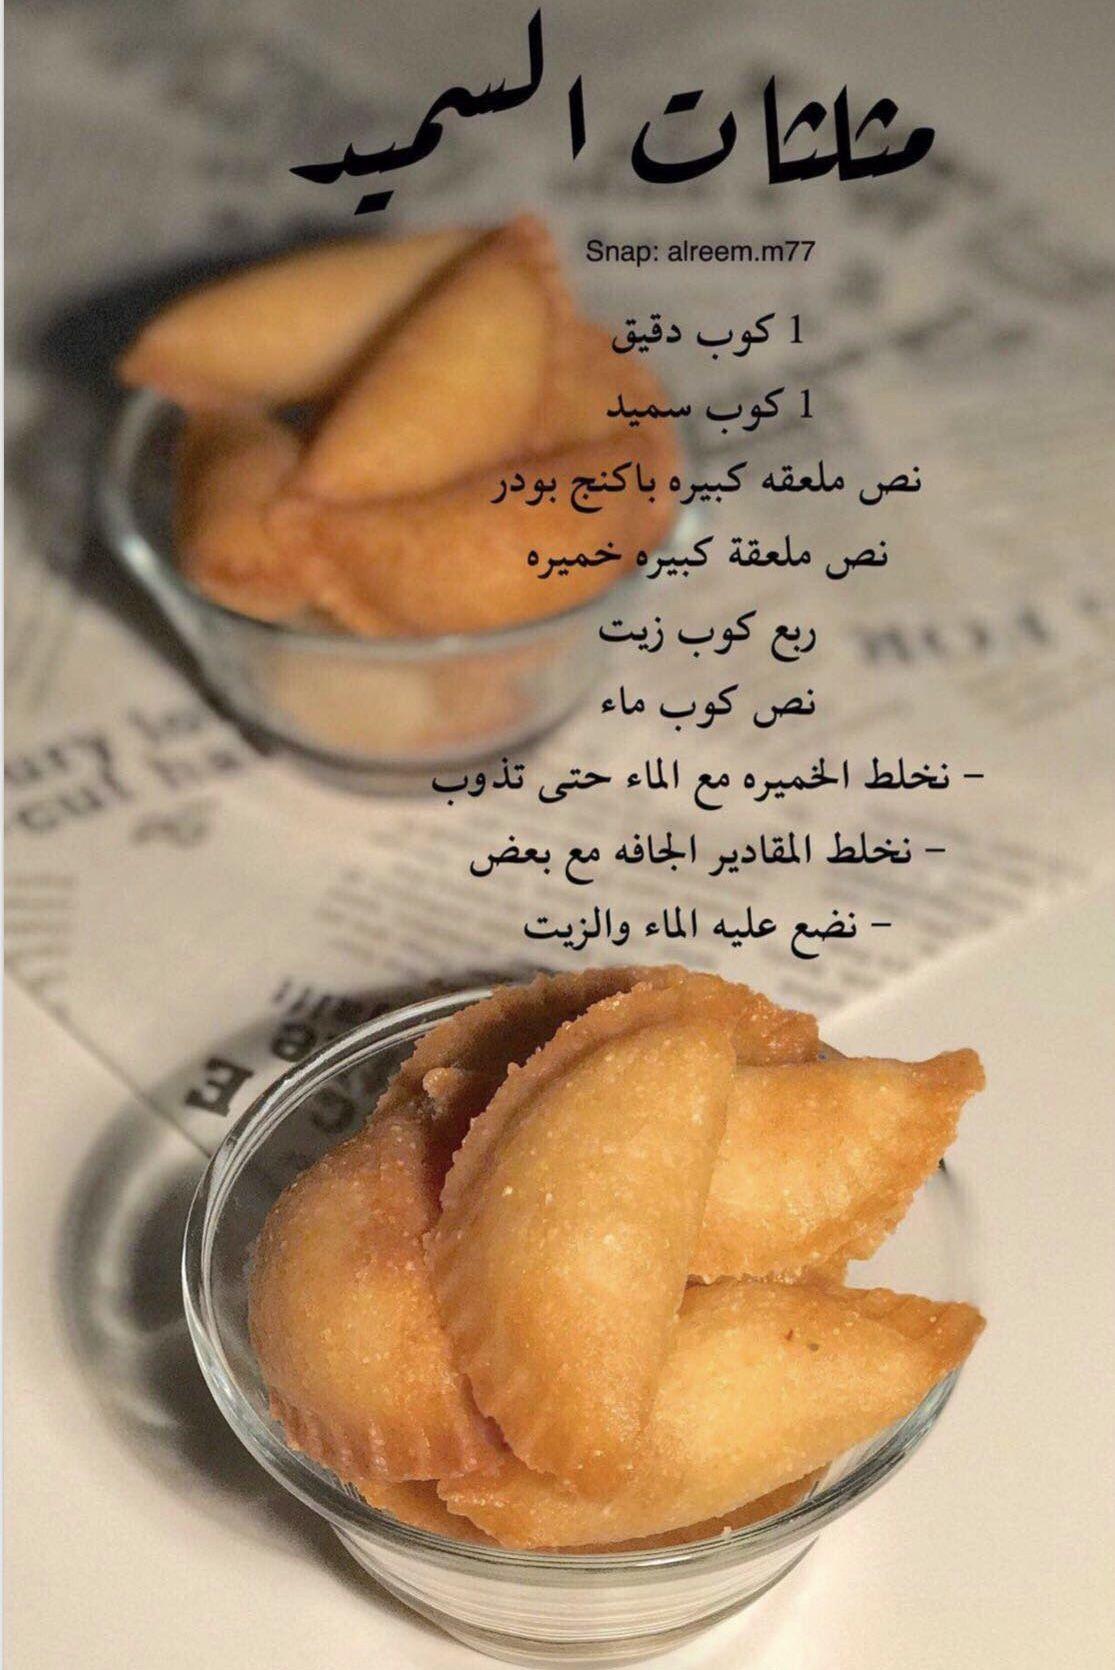 حلويات رمضان بالصور الحلويات الرمضانية وطرق عملها Arabic Sweets Recipes Cooking Recipes Desserts Food Receipes